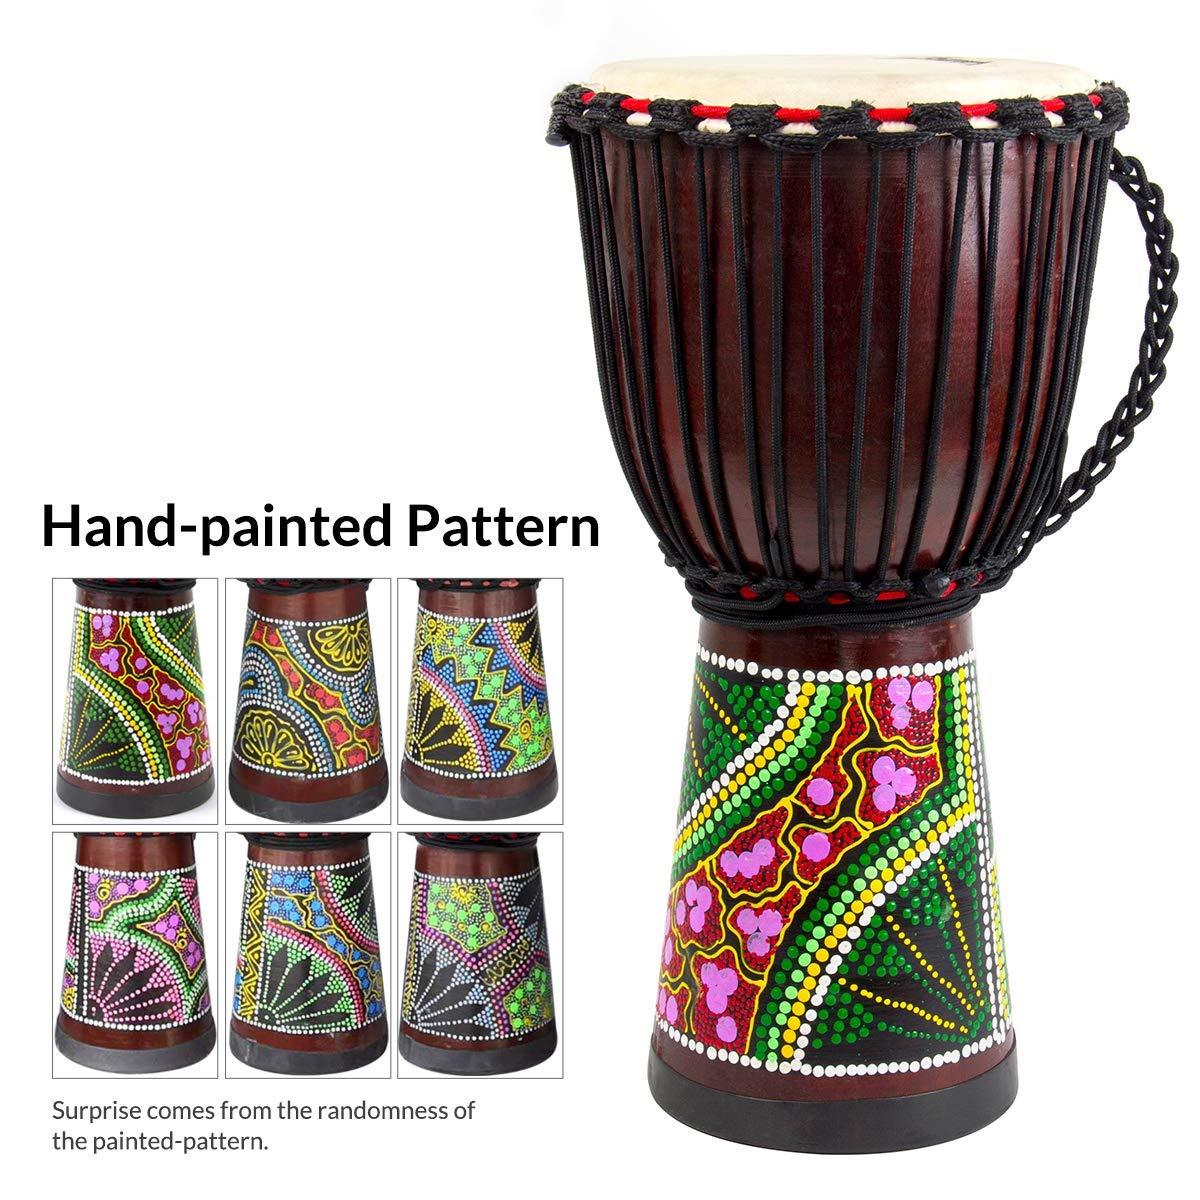 African Drum, Hand-Painted Bongo Congo Djembe Drum 9.5'' x 20'' Mahogany Goatskin Drumhead for Children Starter Beginners by AKLOT